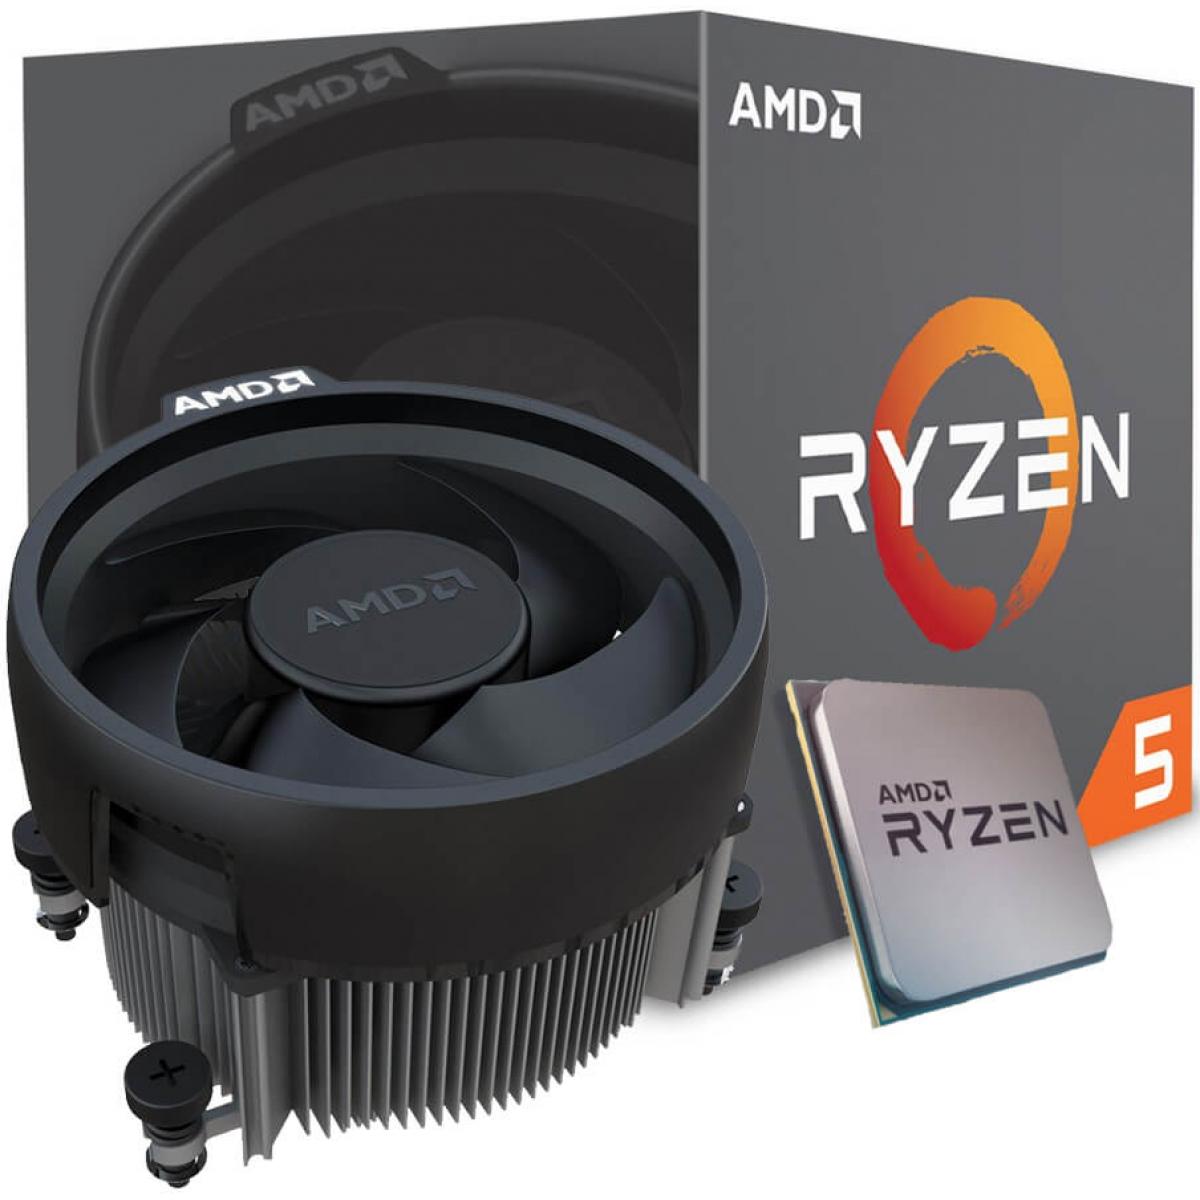 Processador AMD Ryzen 5 1600 3.2GHz (3.6GHz Turbo), 6-Core 12-Thread, Cooler Wraith Spire, AM4, YD1600BBAEBOX, S/ Video